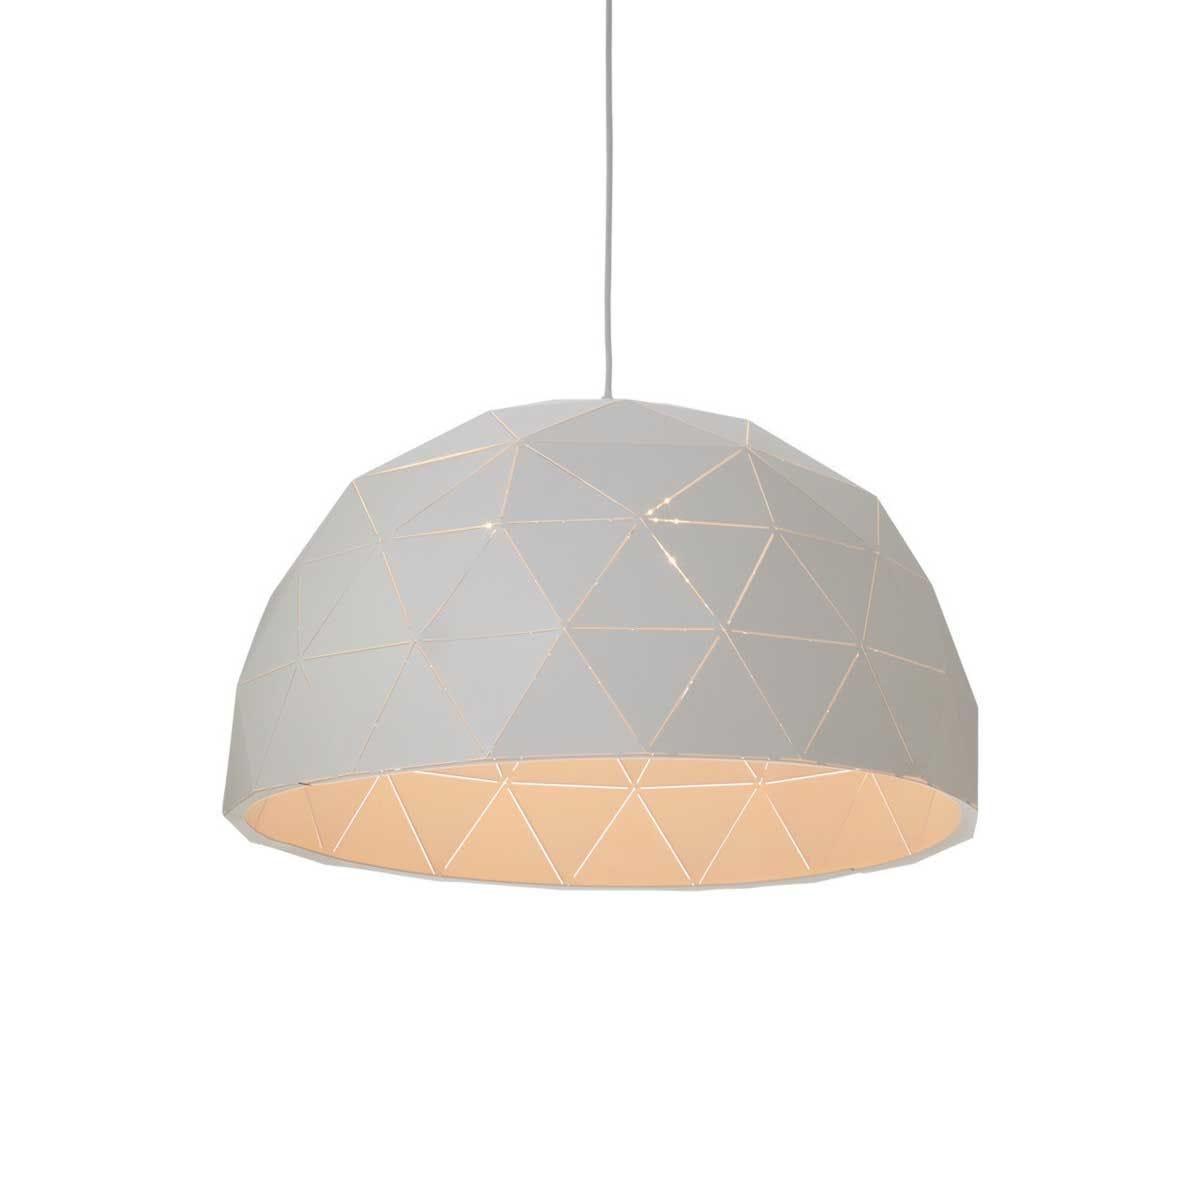 Premier Housewares Mateo Large Dome Pendant Light - White